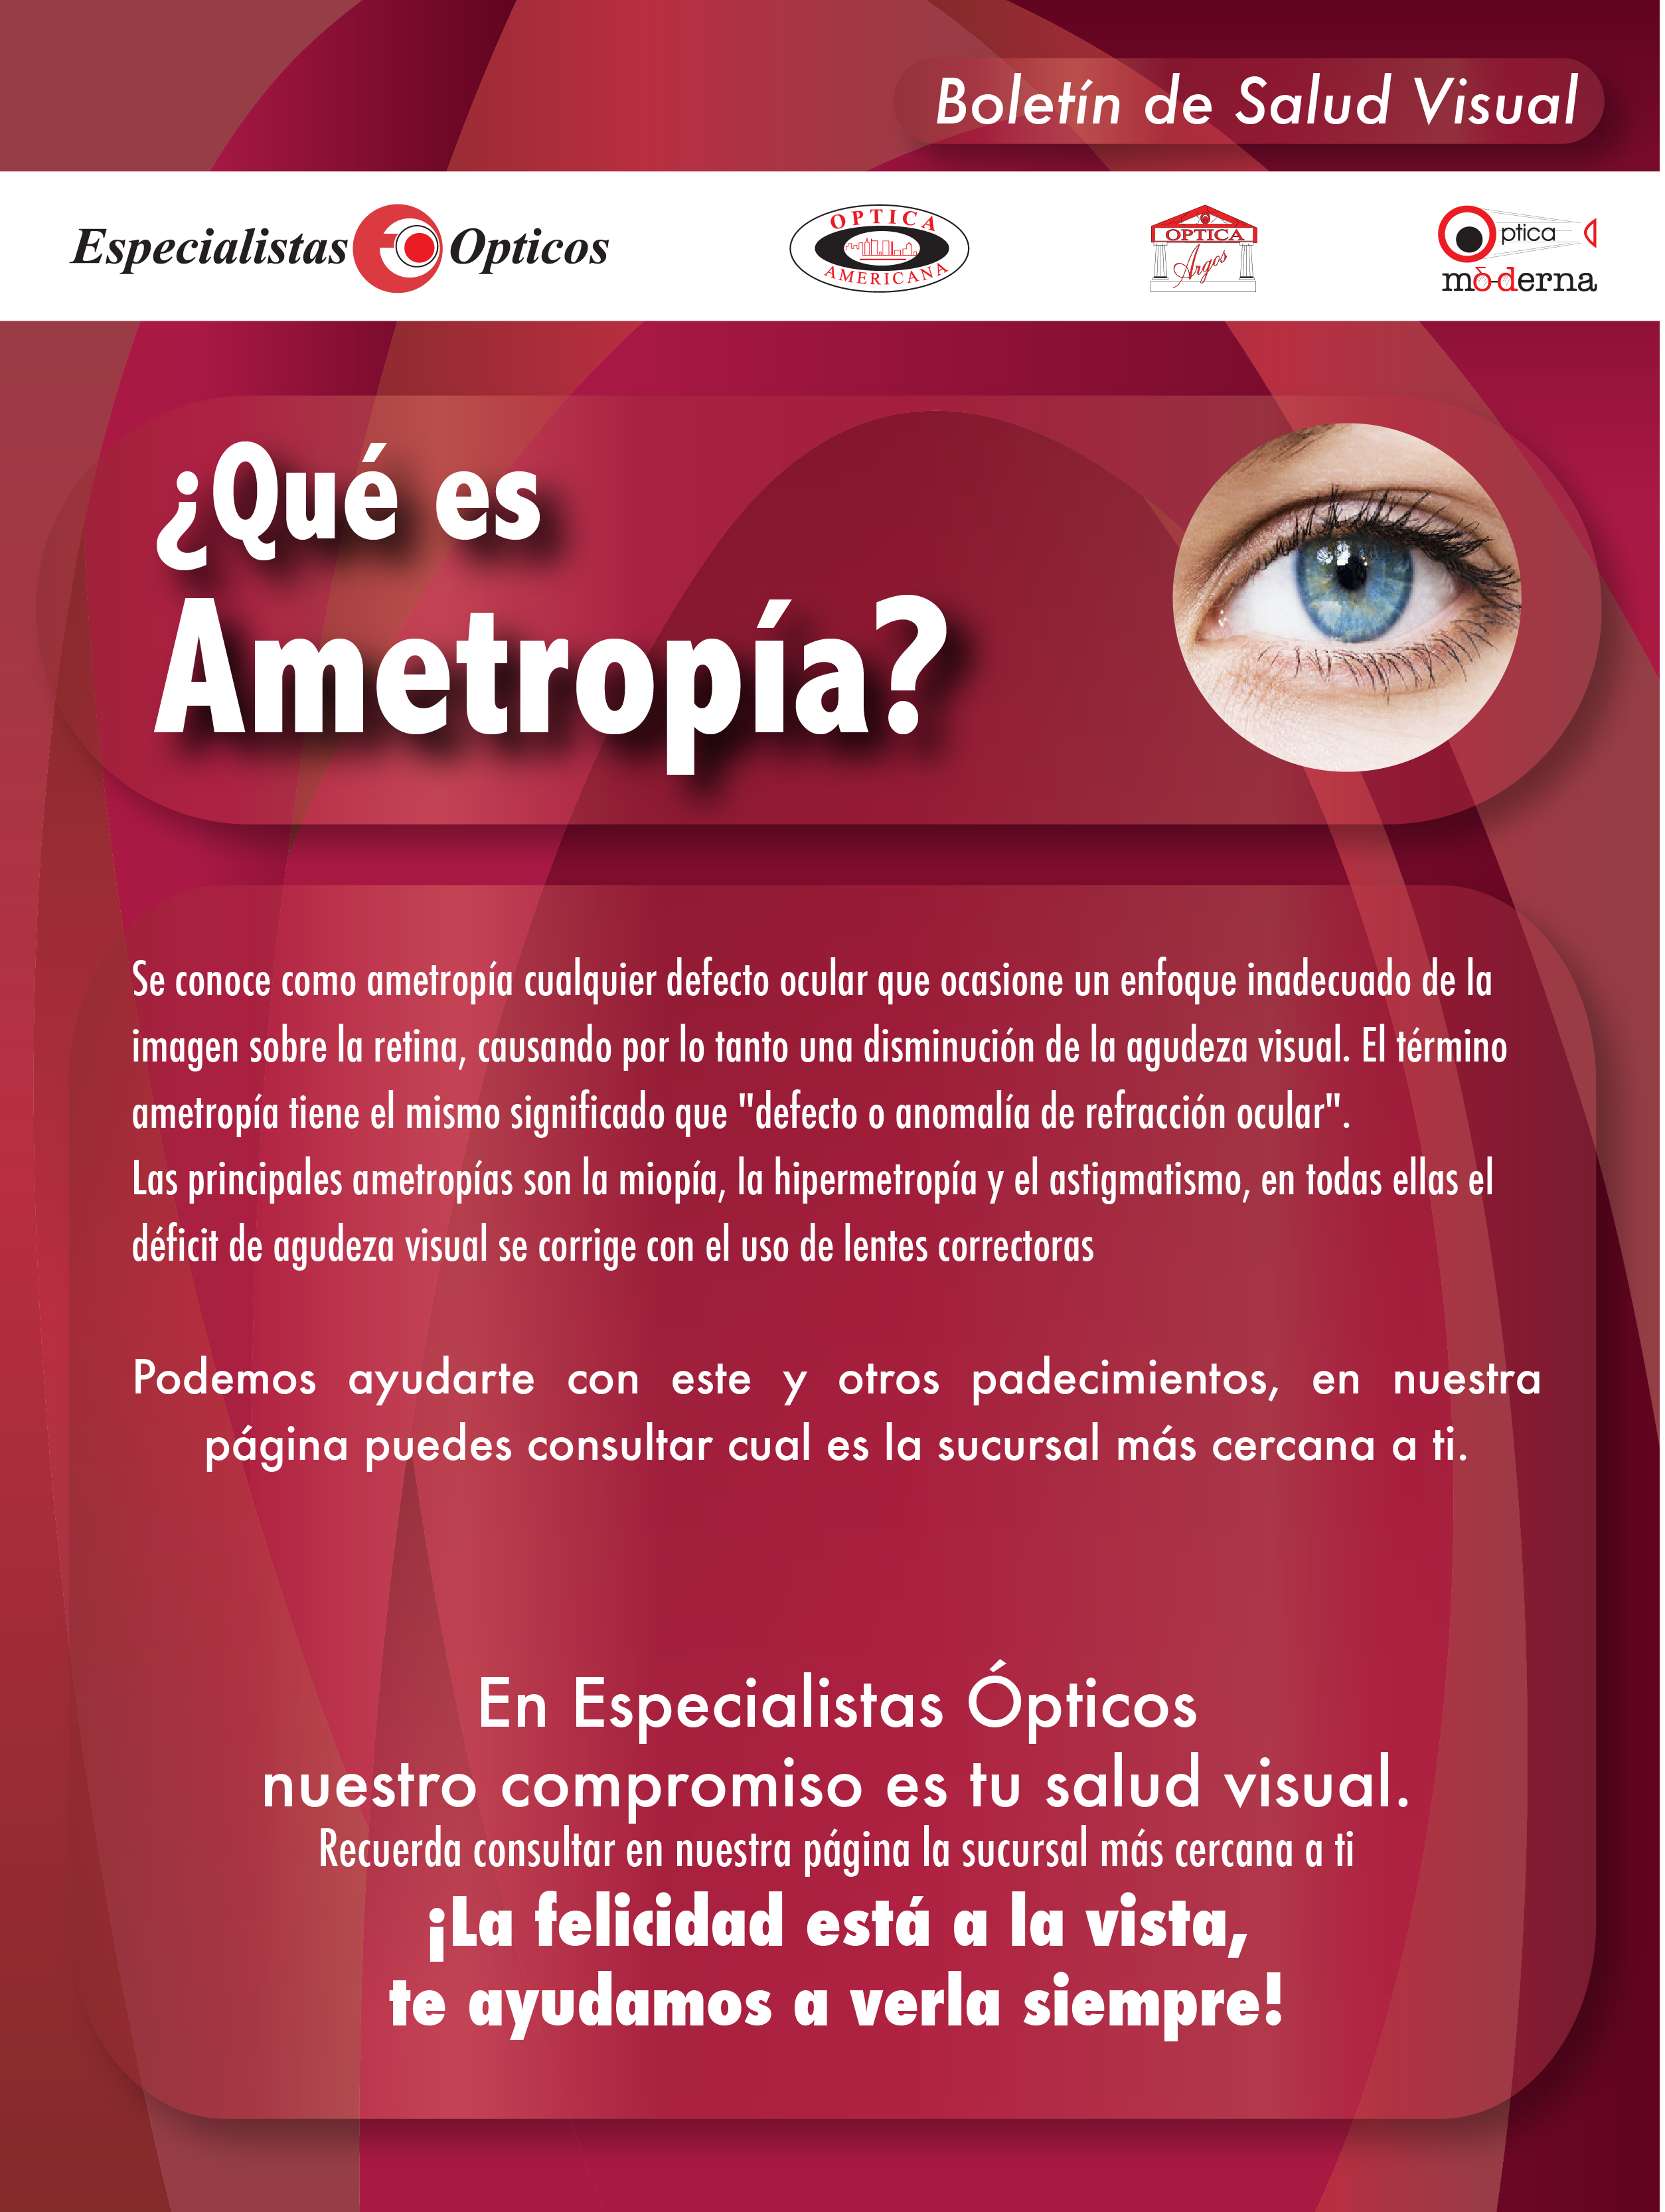 Sabes qué es Ametropía?   salud visual   Pinterest   Optometry